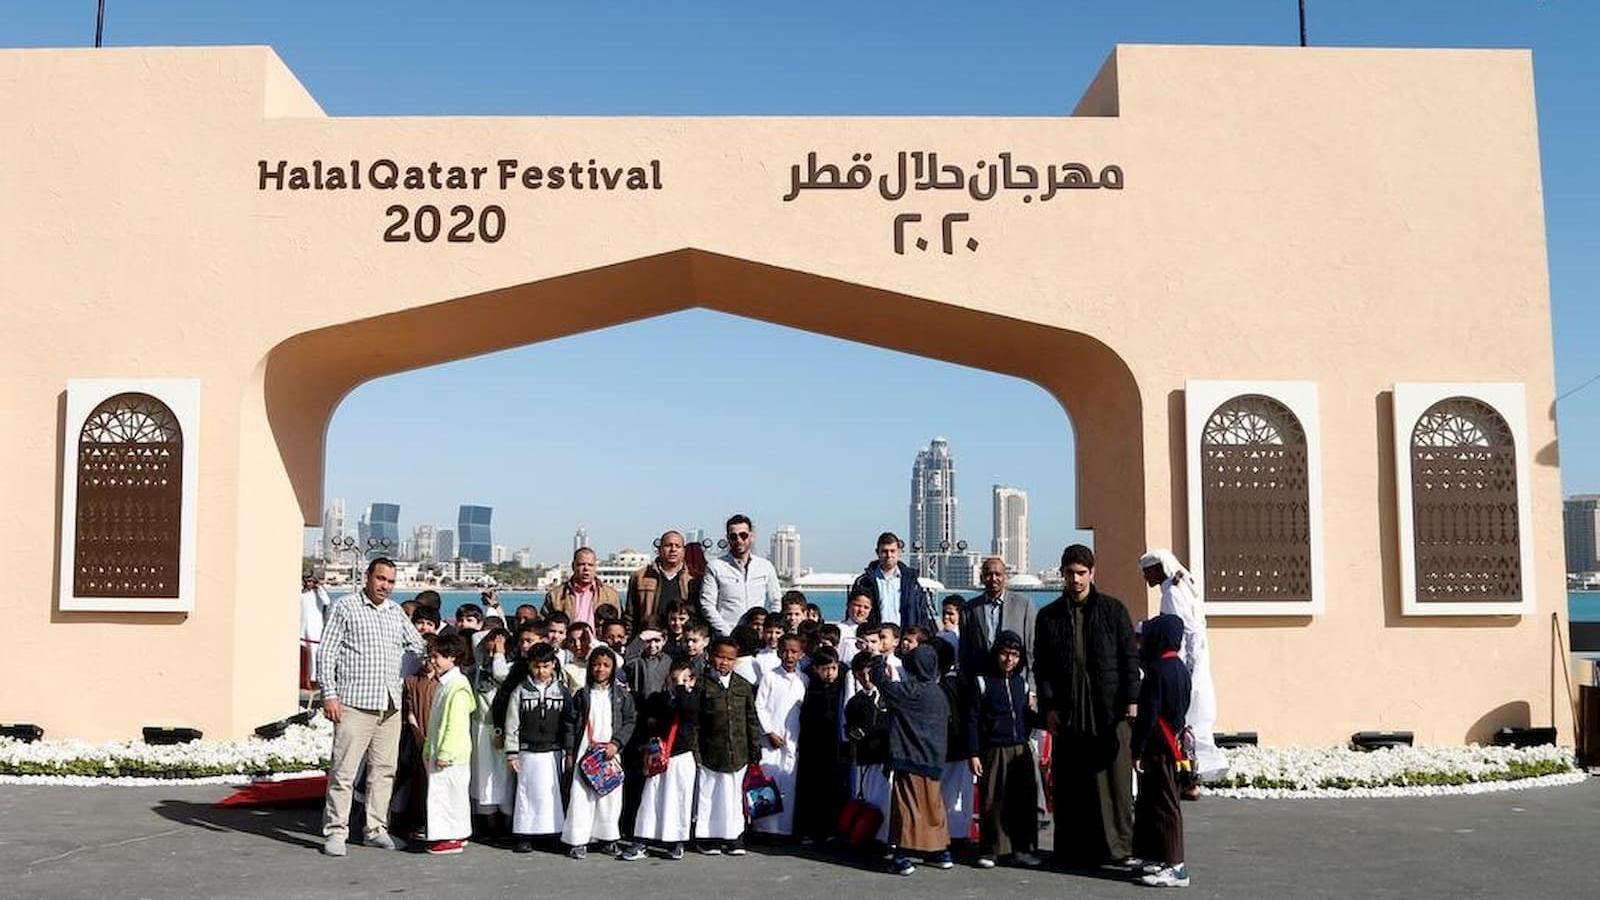 Halal Qatar Festival 2020 underway at Katara